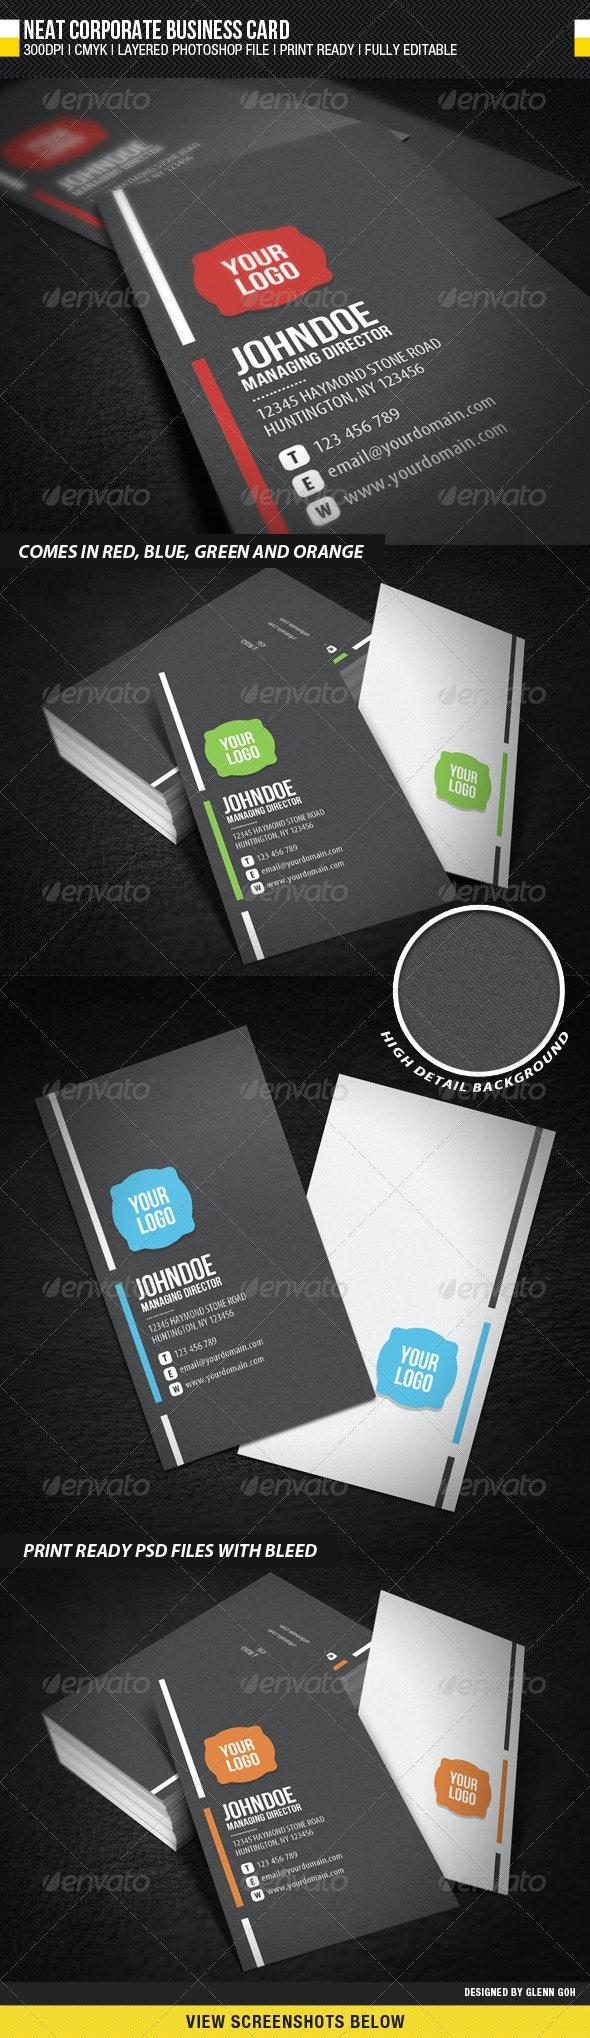 Neat Corporate Business Card - Corporate Business Cards